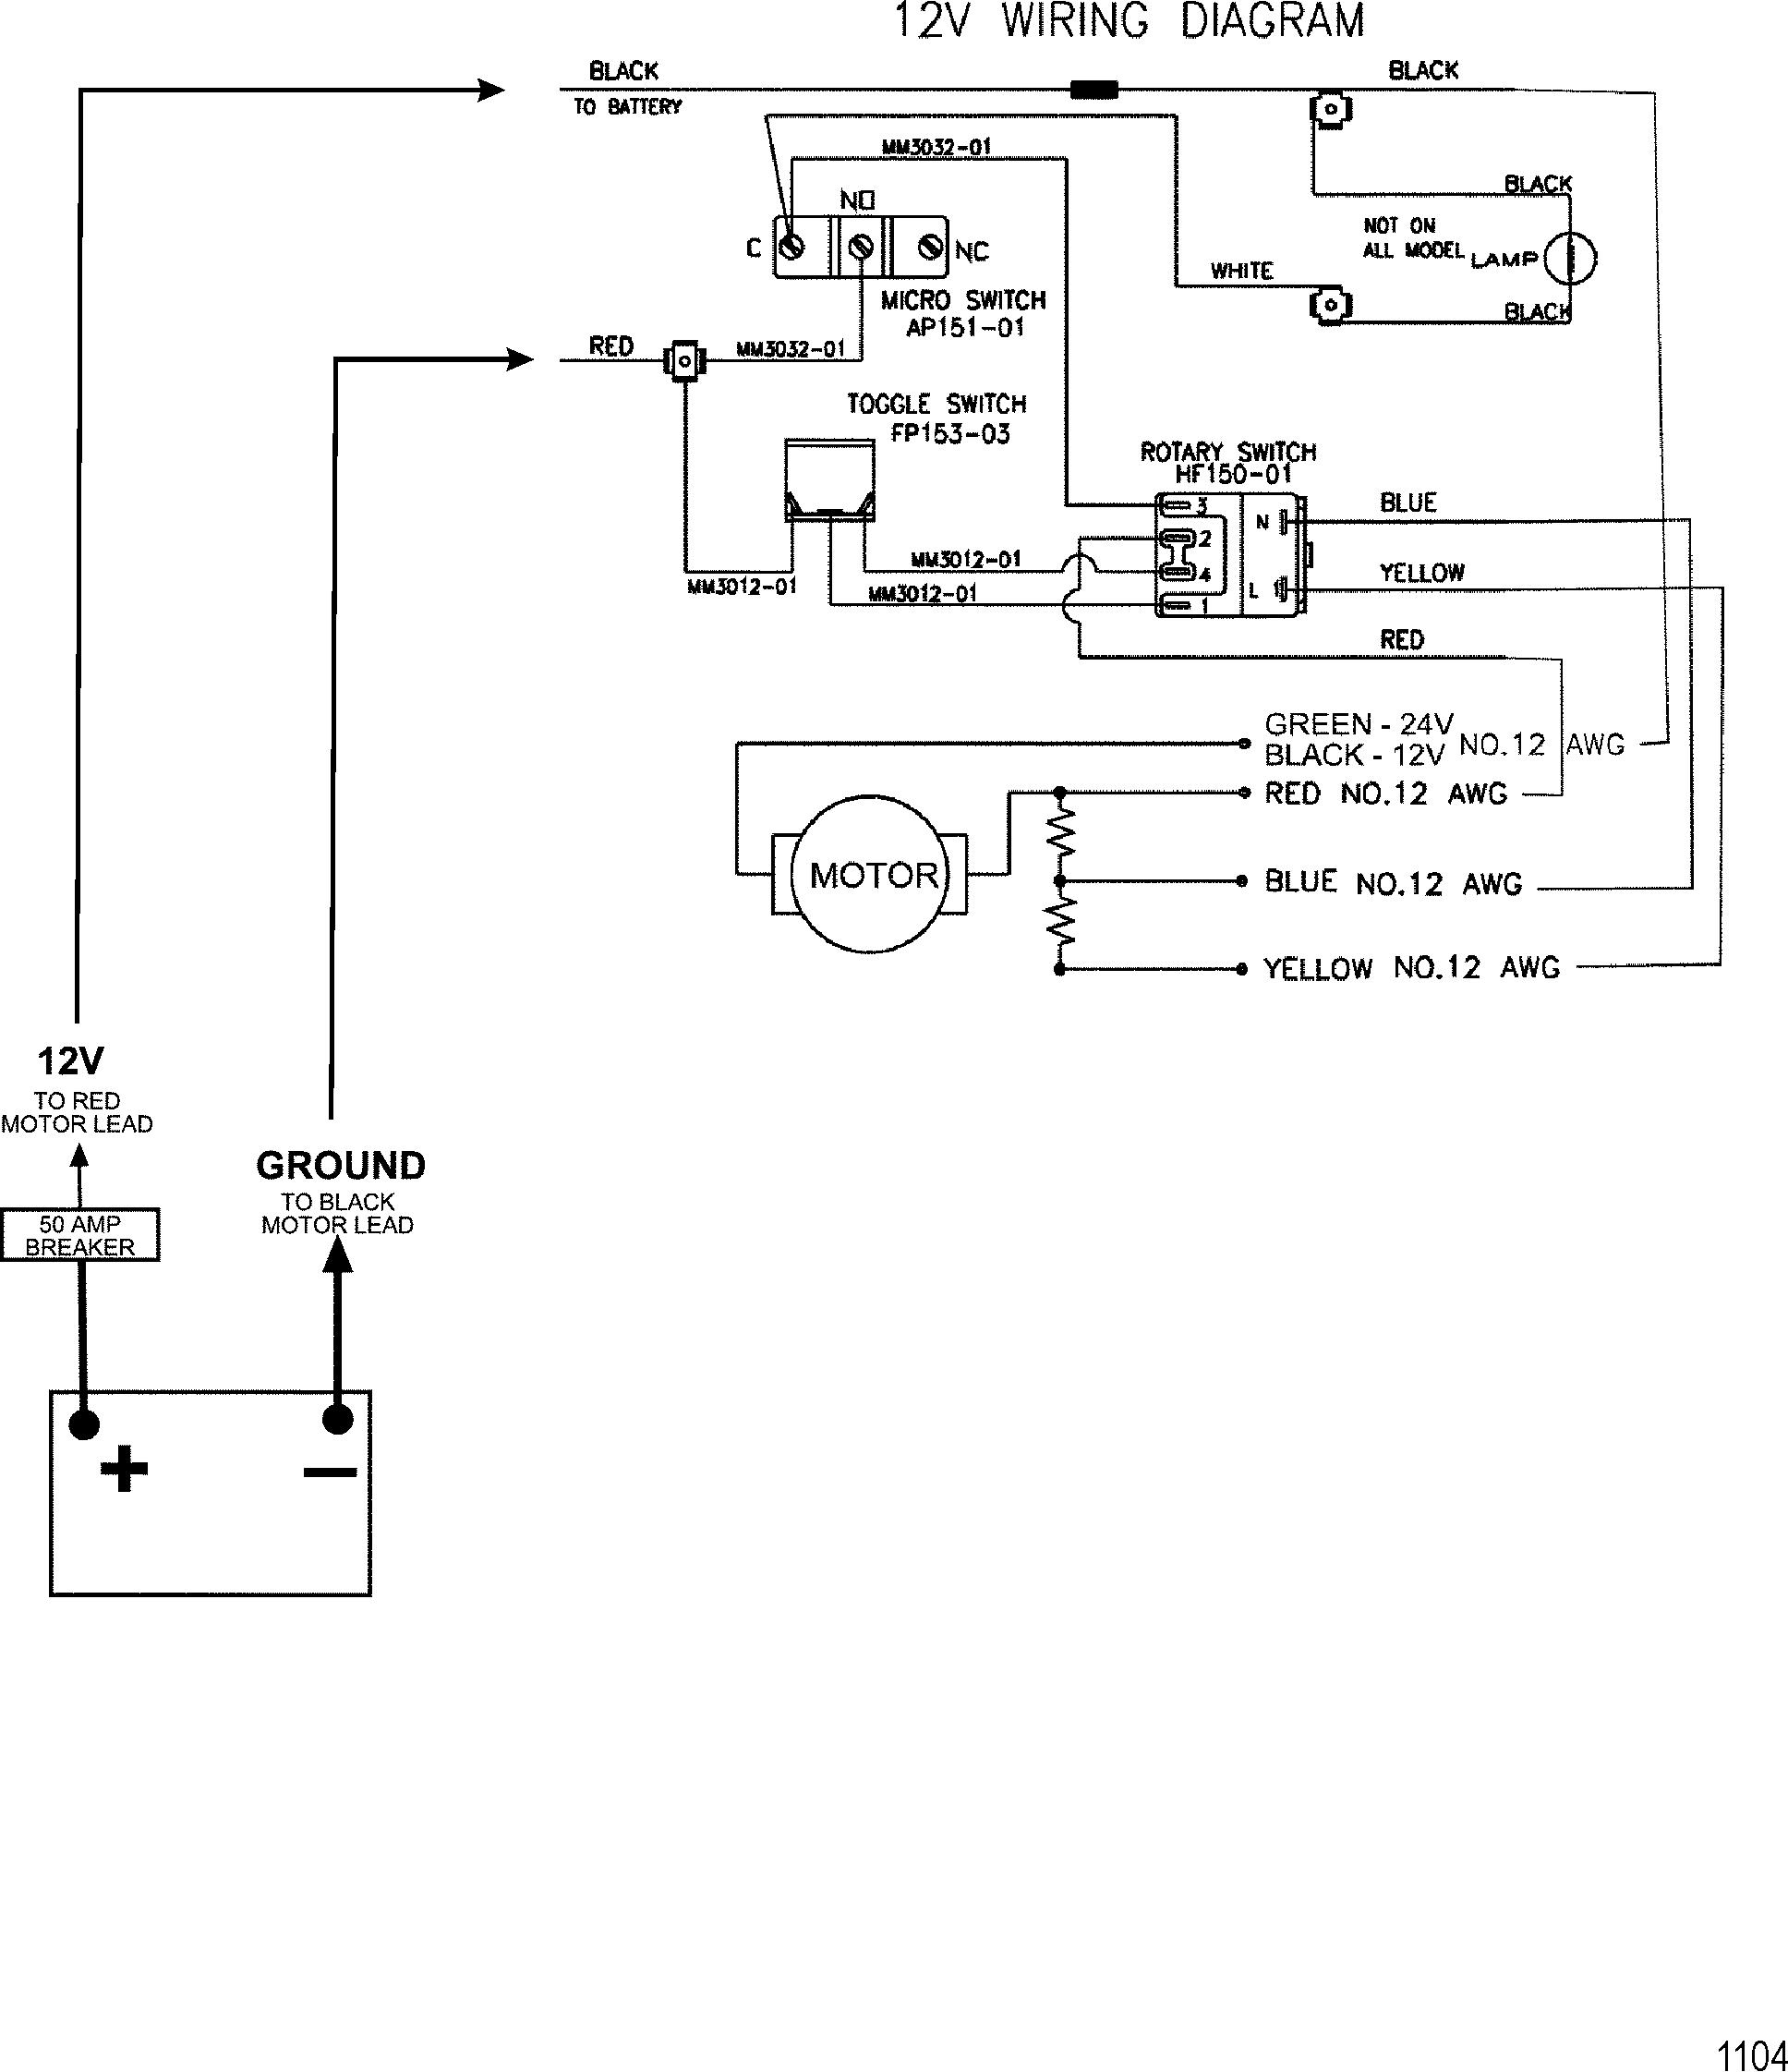 DIAGRAM] 24 Volt Trolling Motor Wiring Diagram FULL Version HD Quality Wiring  Diagram - STRUCTUREDSETTLEME.NIBERMA.FRstructuredsettleme.niberma.fr